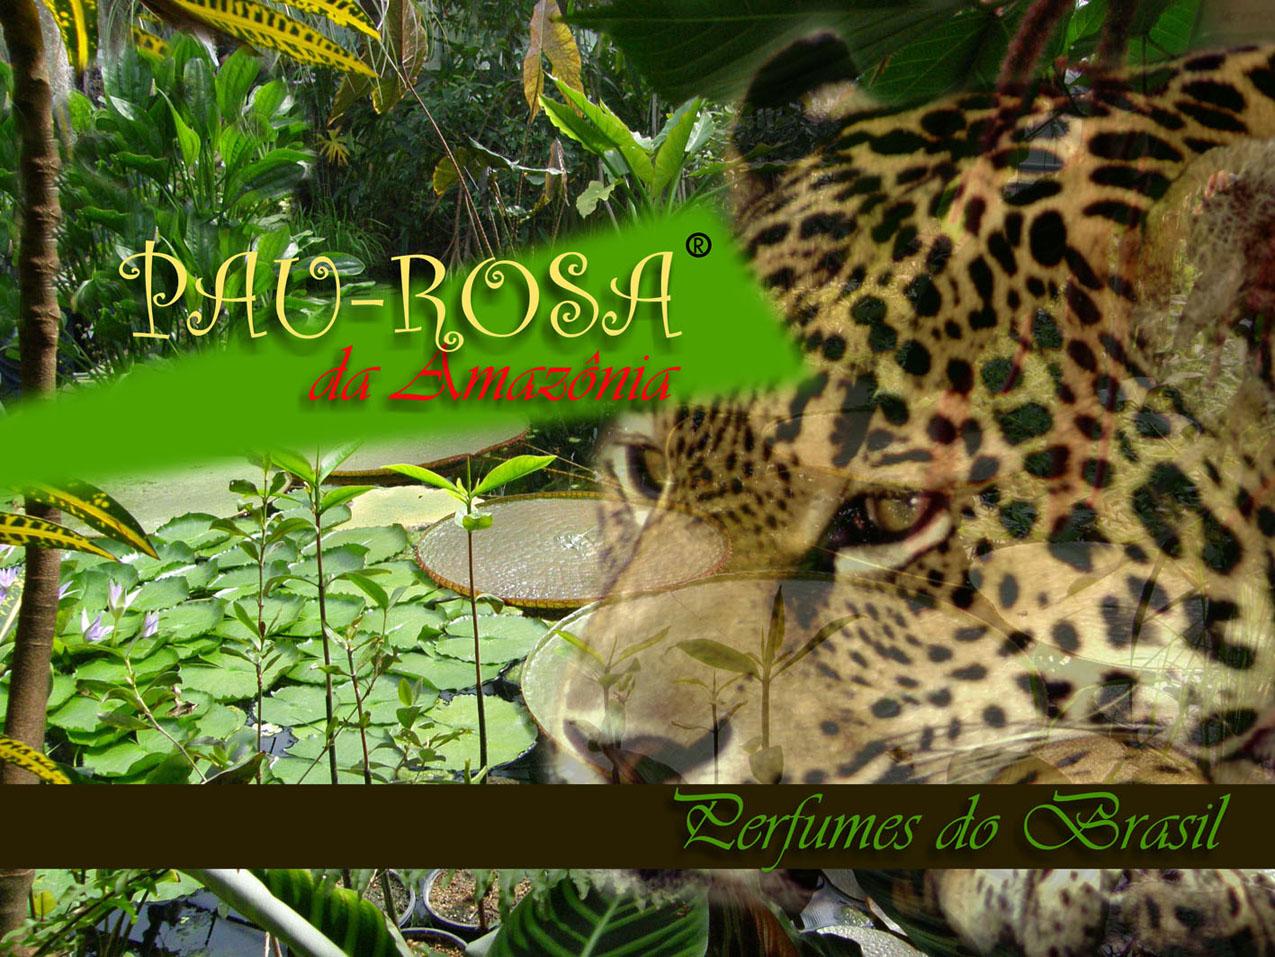 PAU ROSA DA AMAZÔNIA #44820C 1275x957